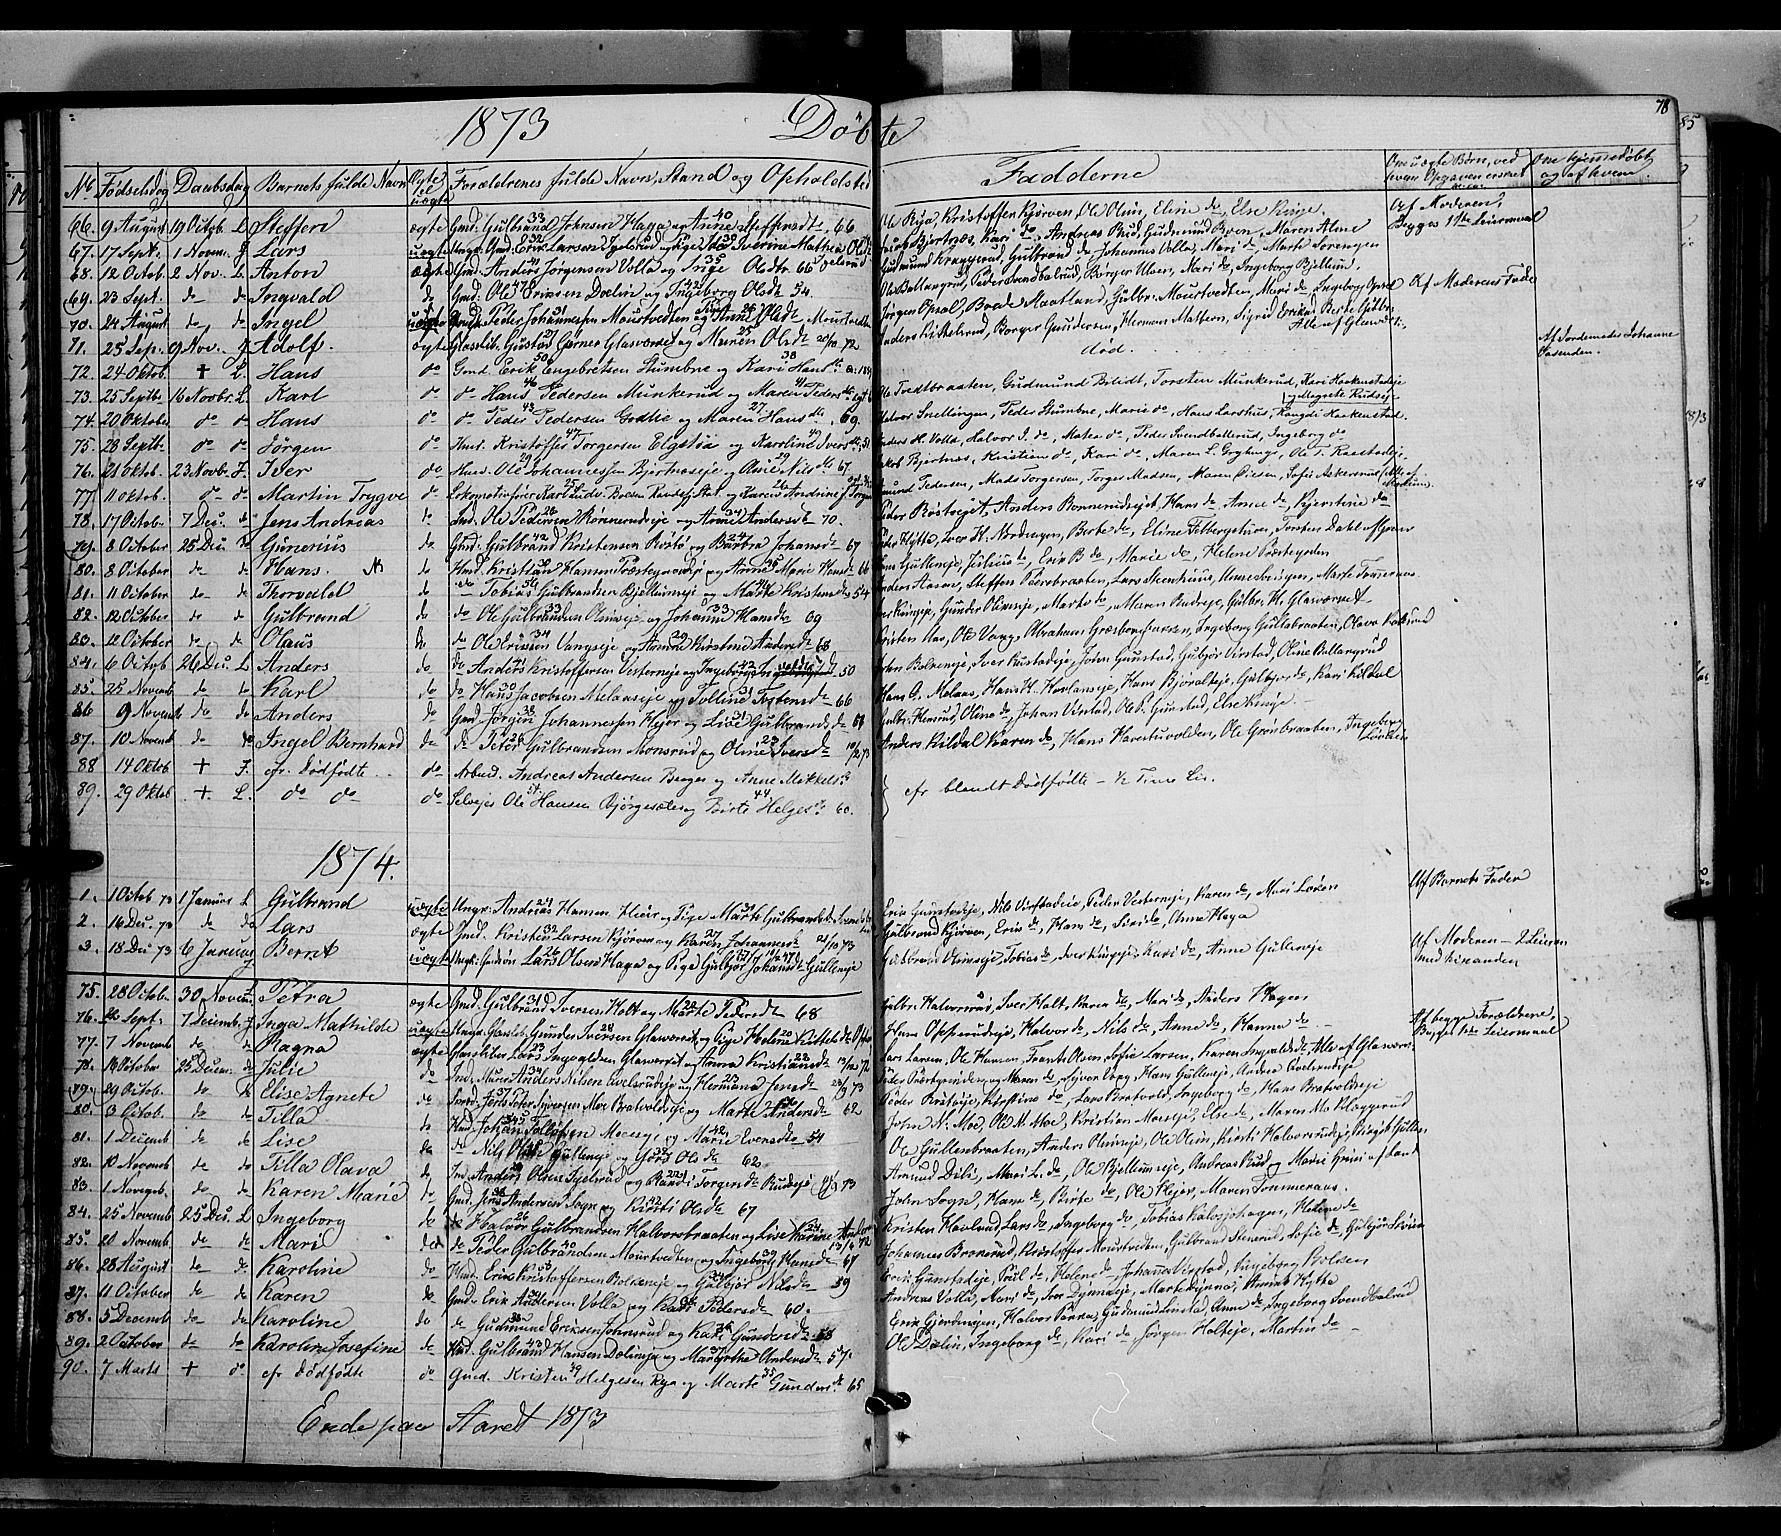 SAH, Jevnaker prestekontor, Ministerialbok nr. 7, 1858-1876, s. 78